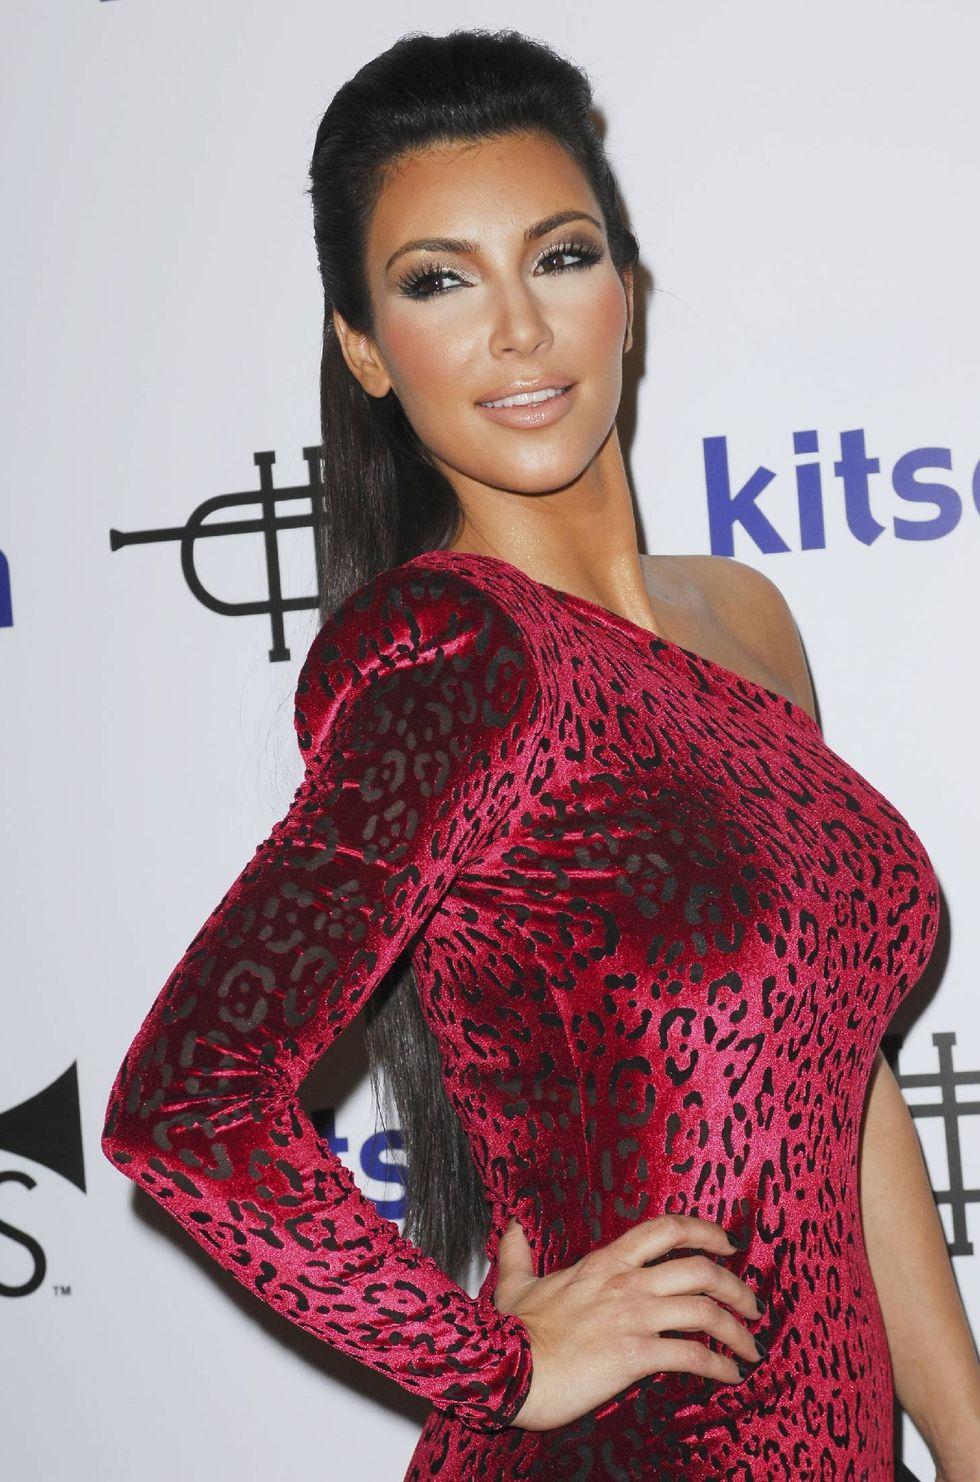 kim-kardashian-rich-soil-fashion-line-launch-in-los-angeles-01